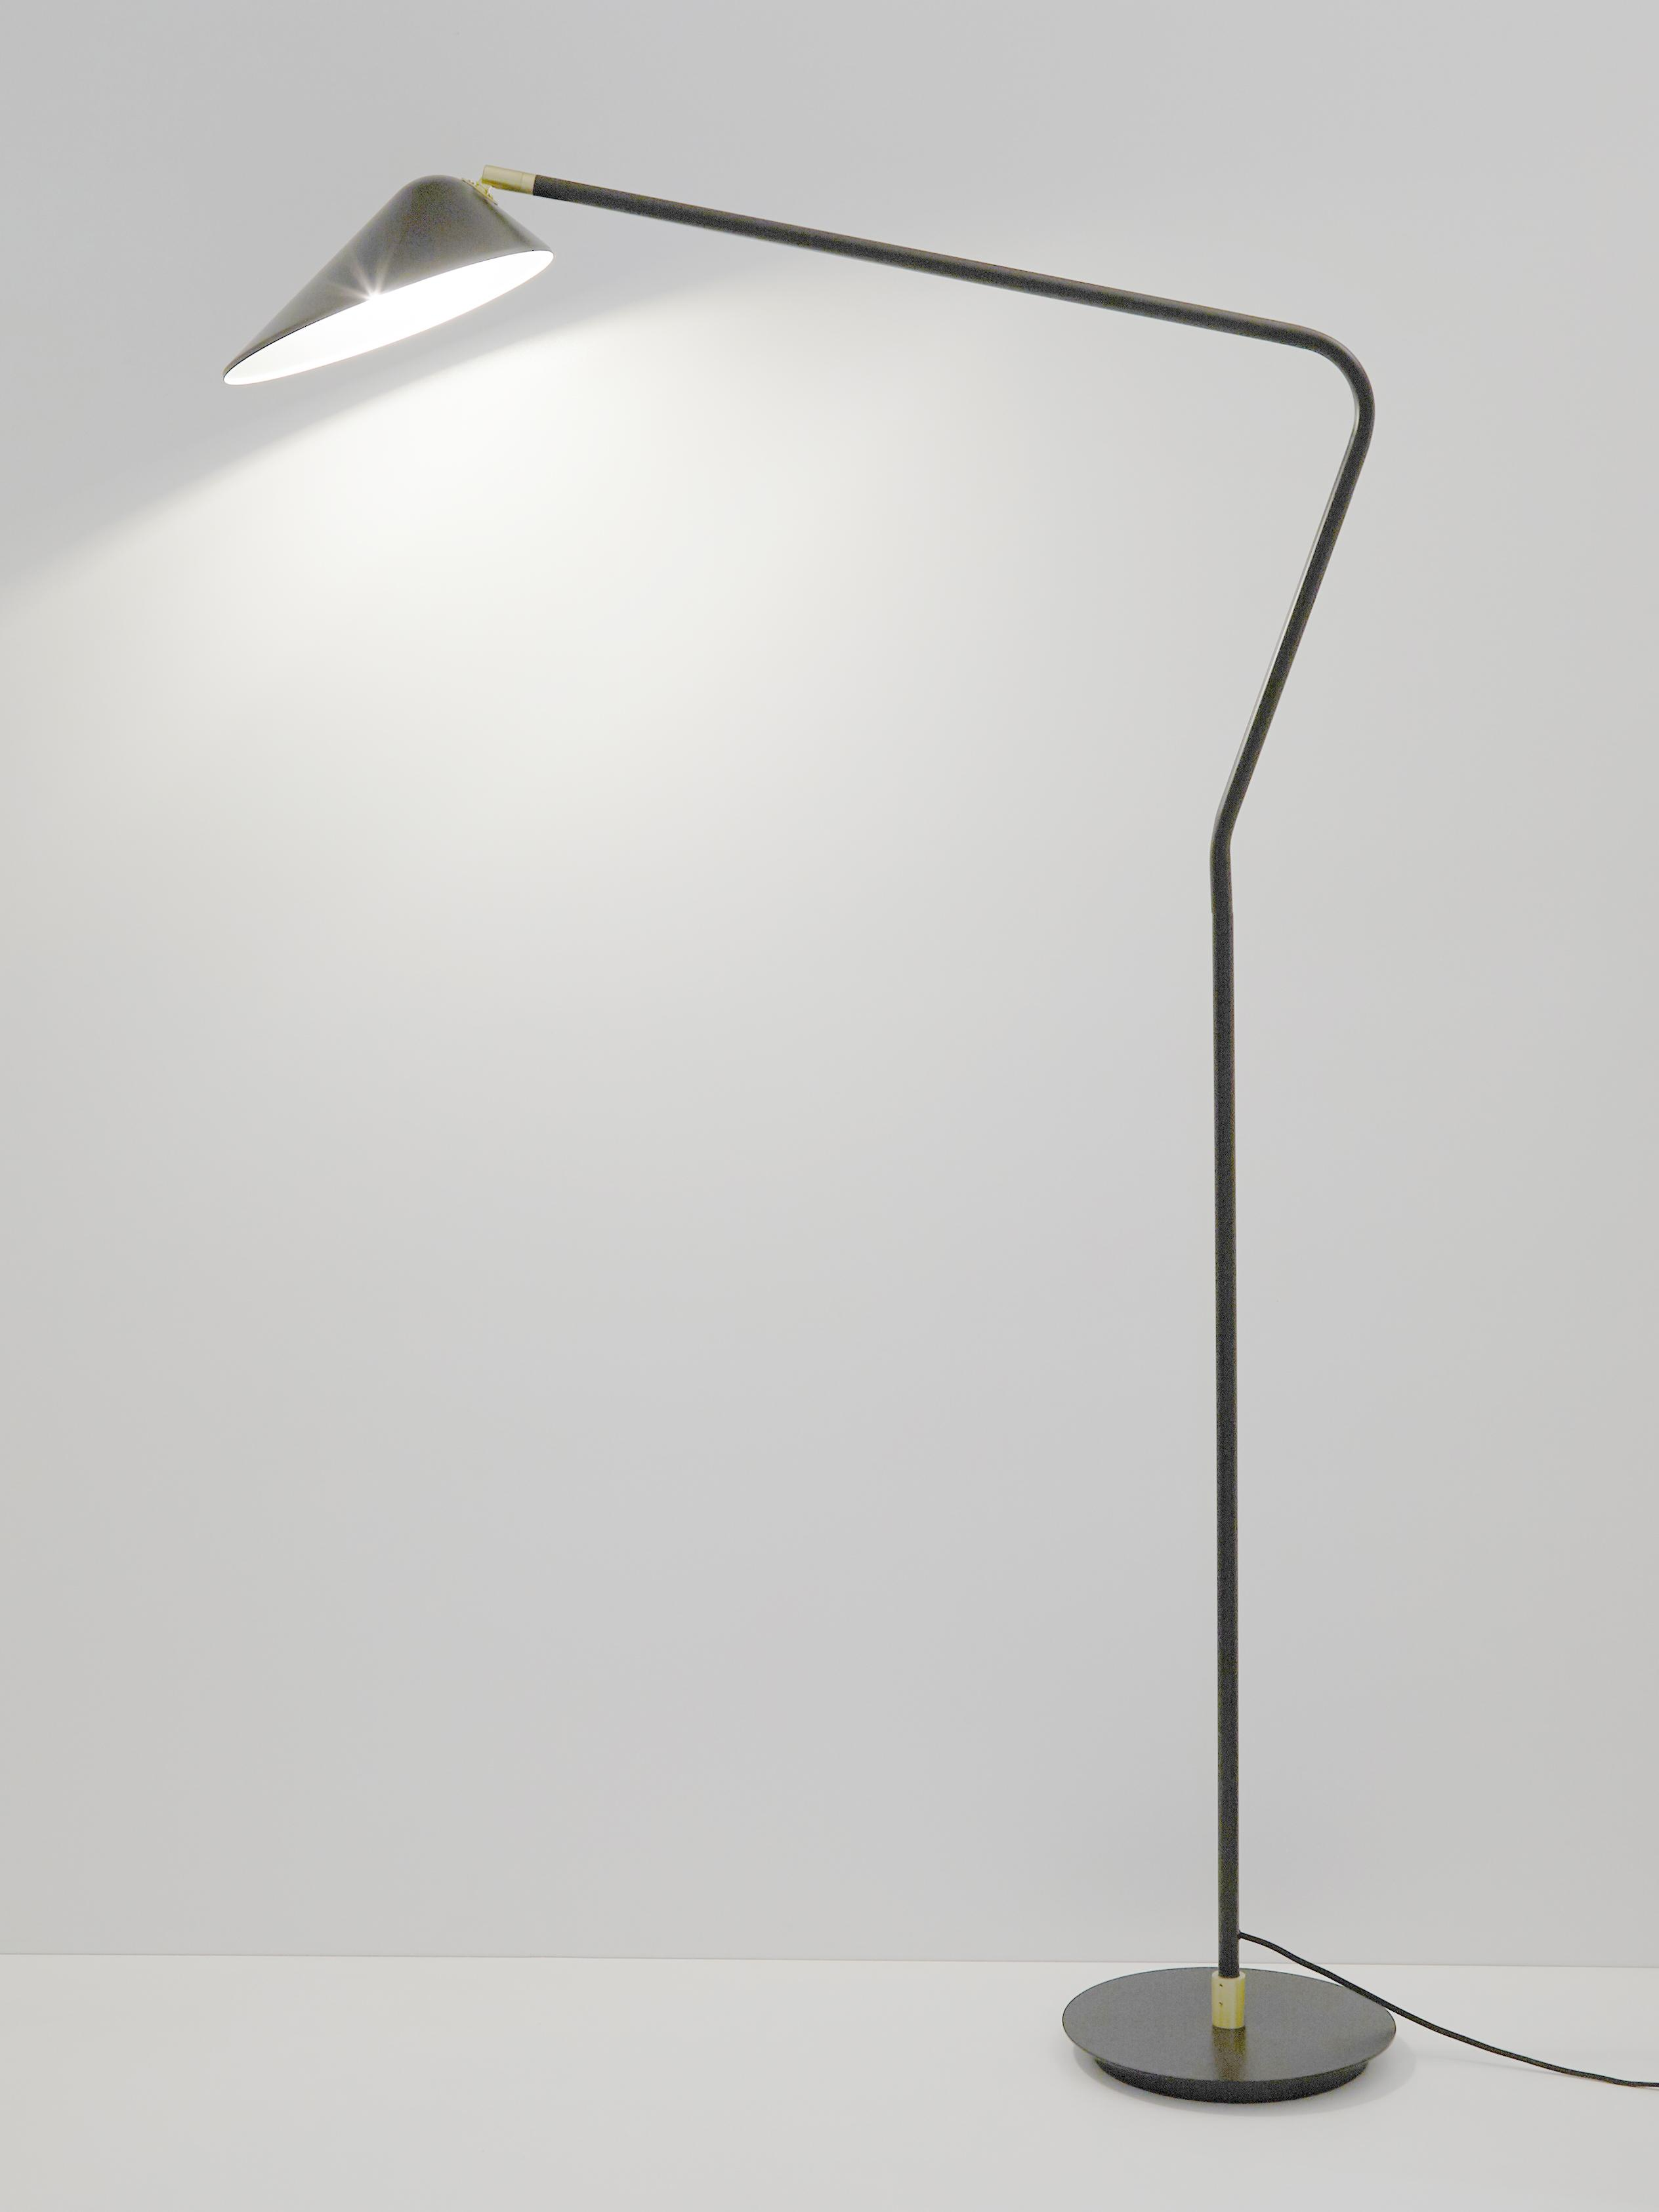 Lampada da terra Neron, Paralume: metallo verniciato a polv, Base della lampada: metallo verniciato a polv, Nero, Larg. 27 x Alt. 171 cm